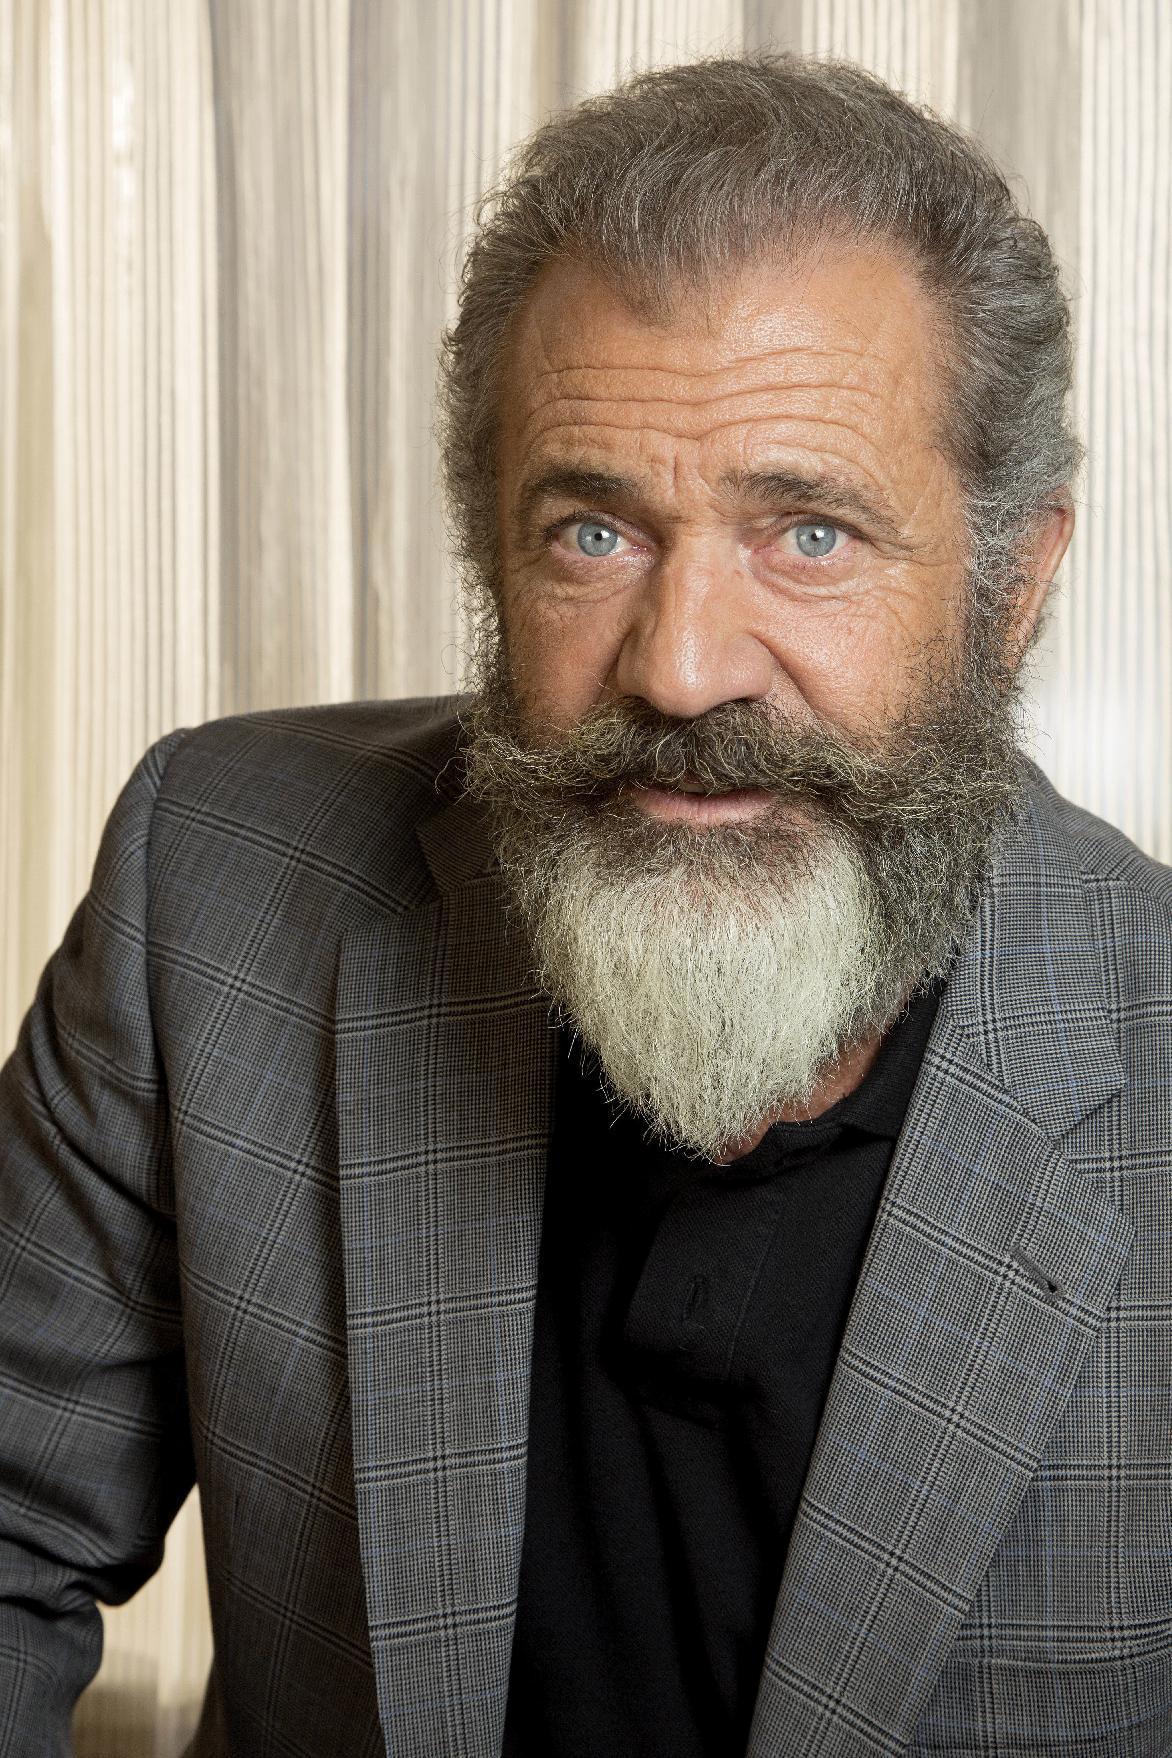 Comeback complete? Mel Gibson gets an Oscar nod